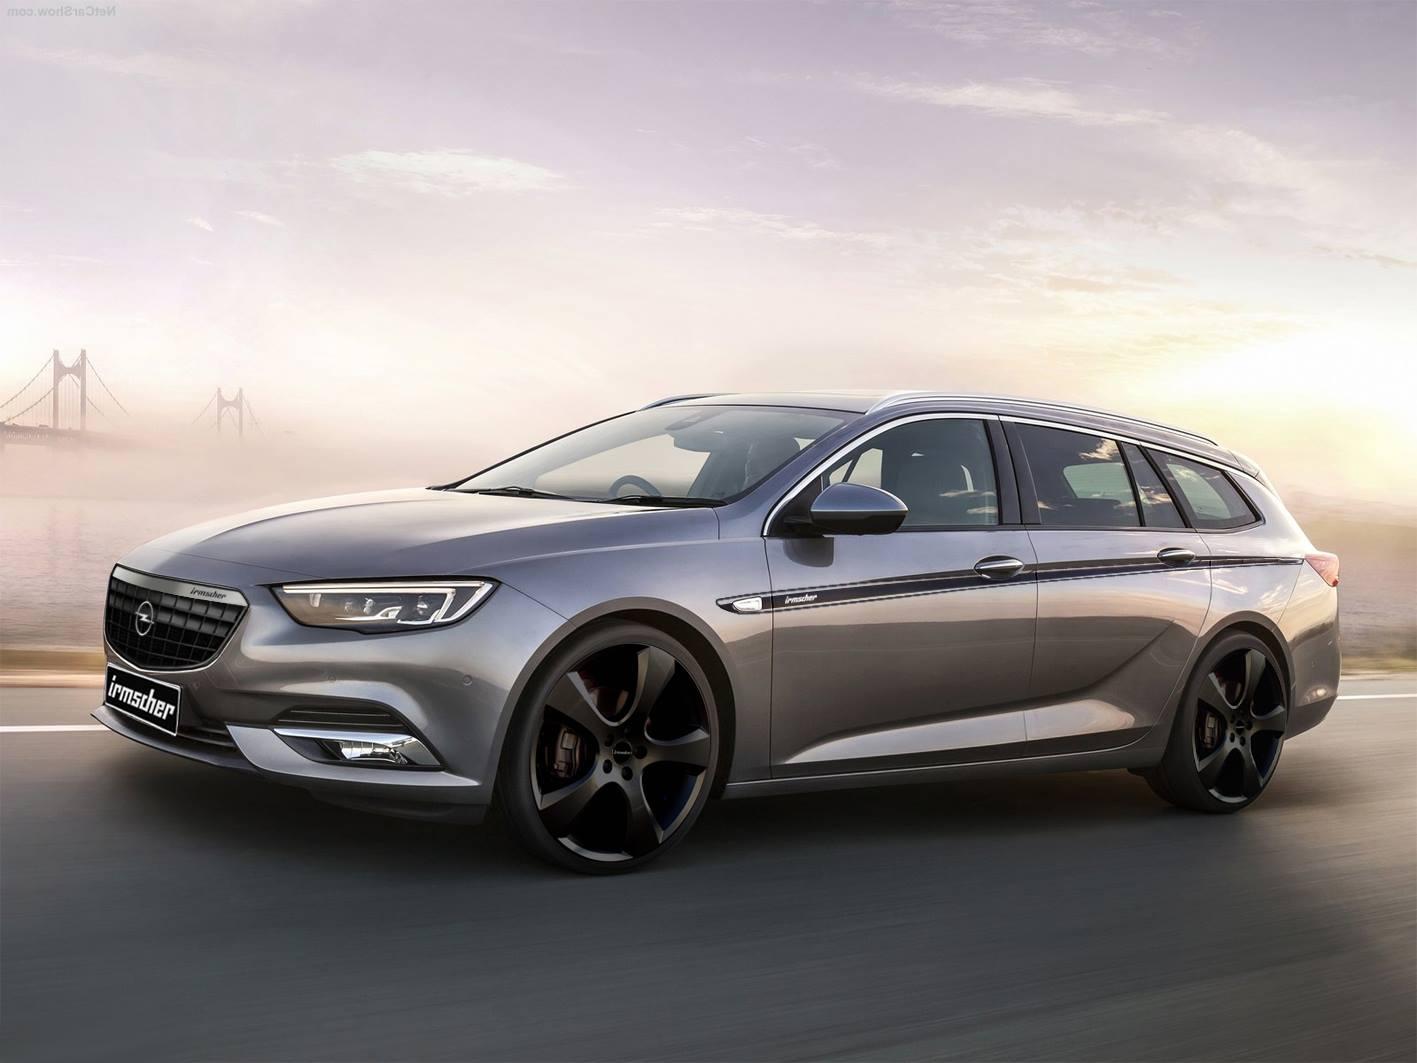 Irmscher 2017 Opel Insignia Oto Kokpit